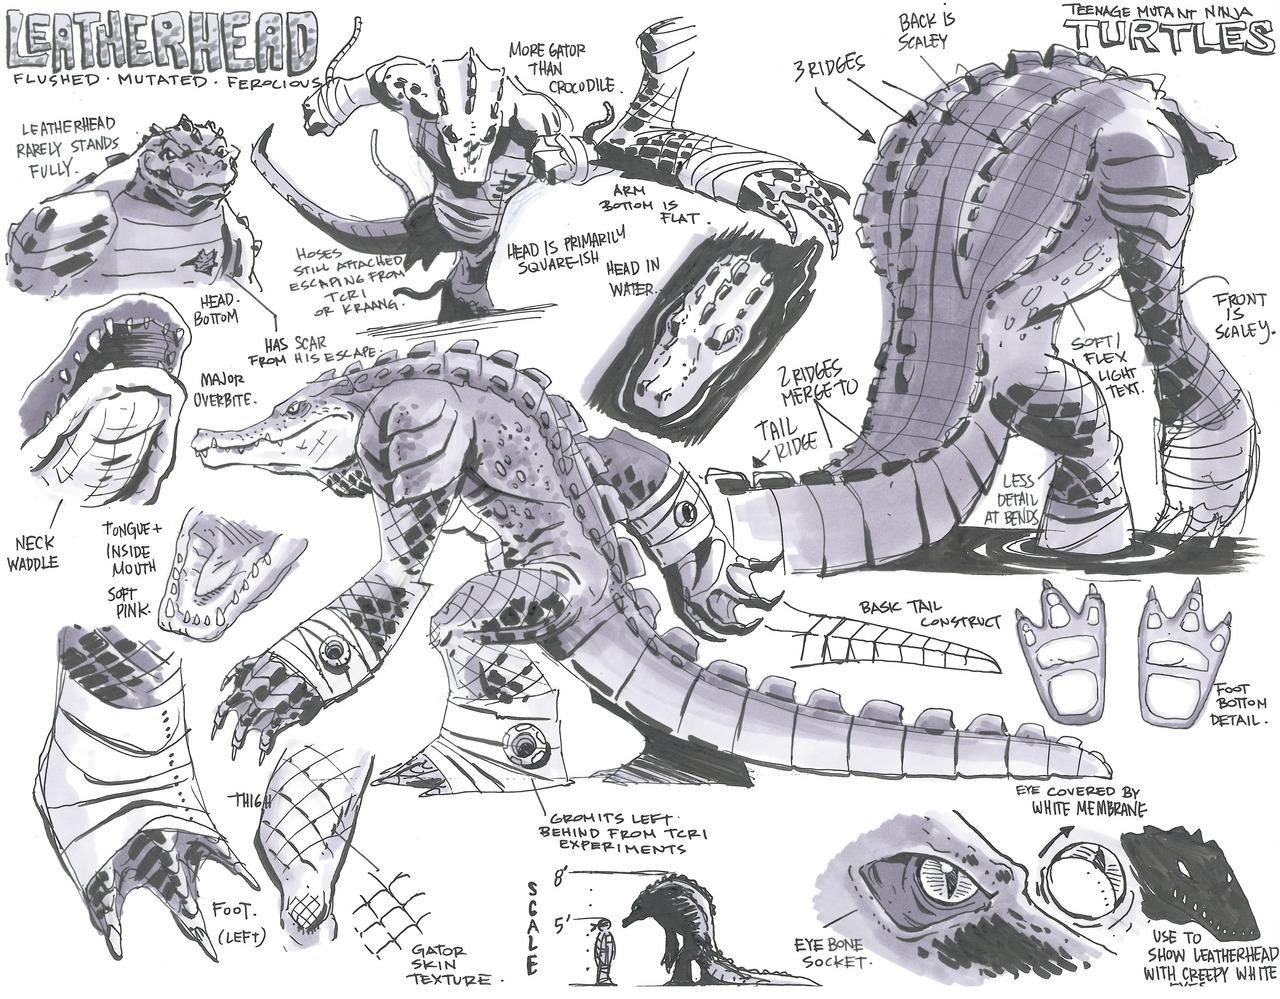 tiger ninja turtles coloring pages - photo#21